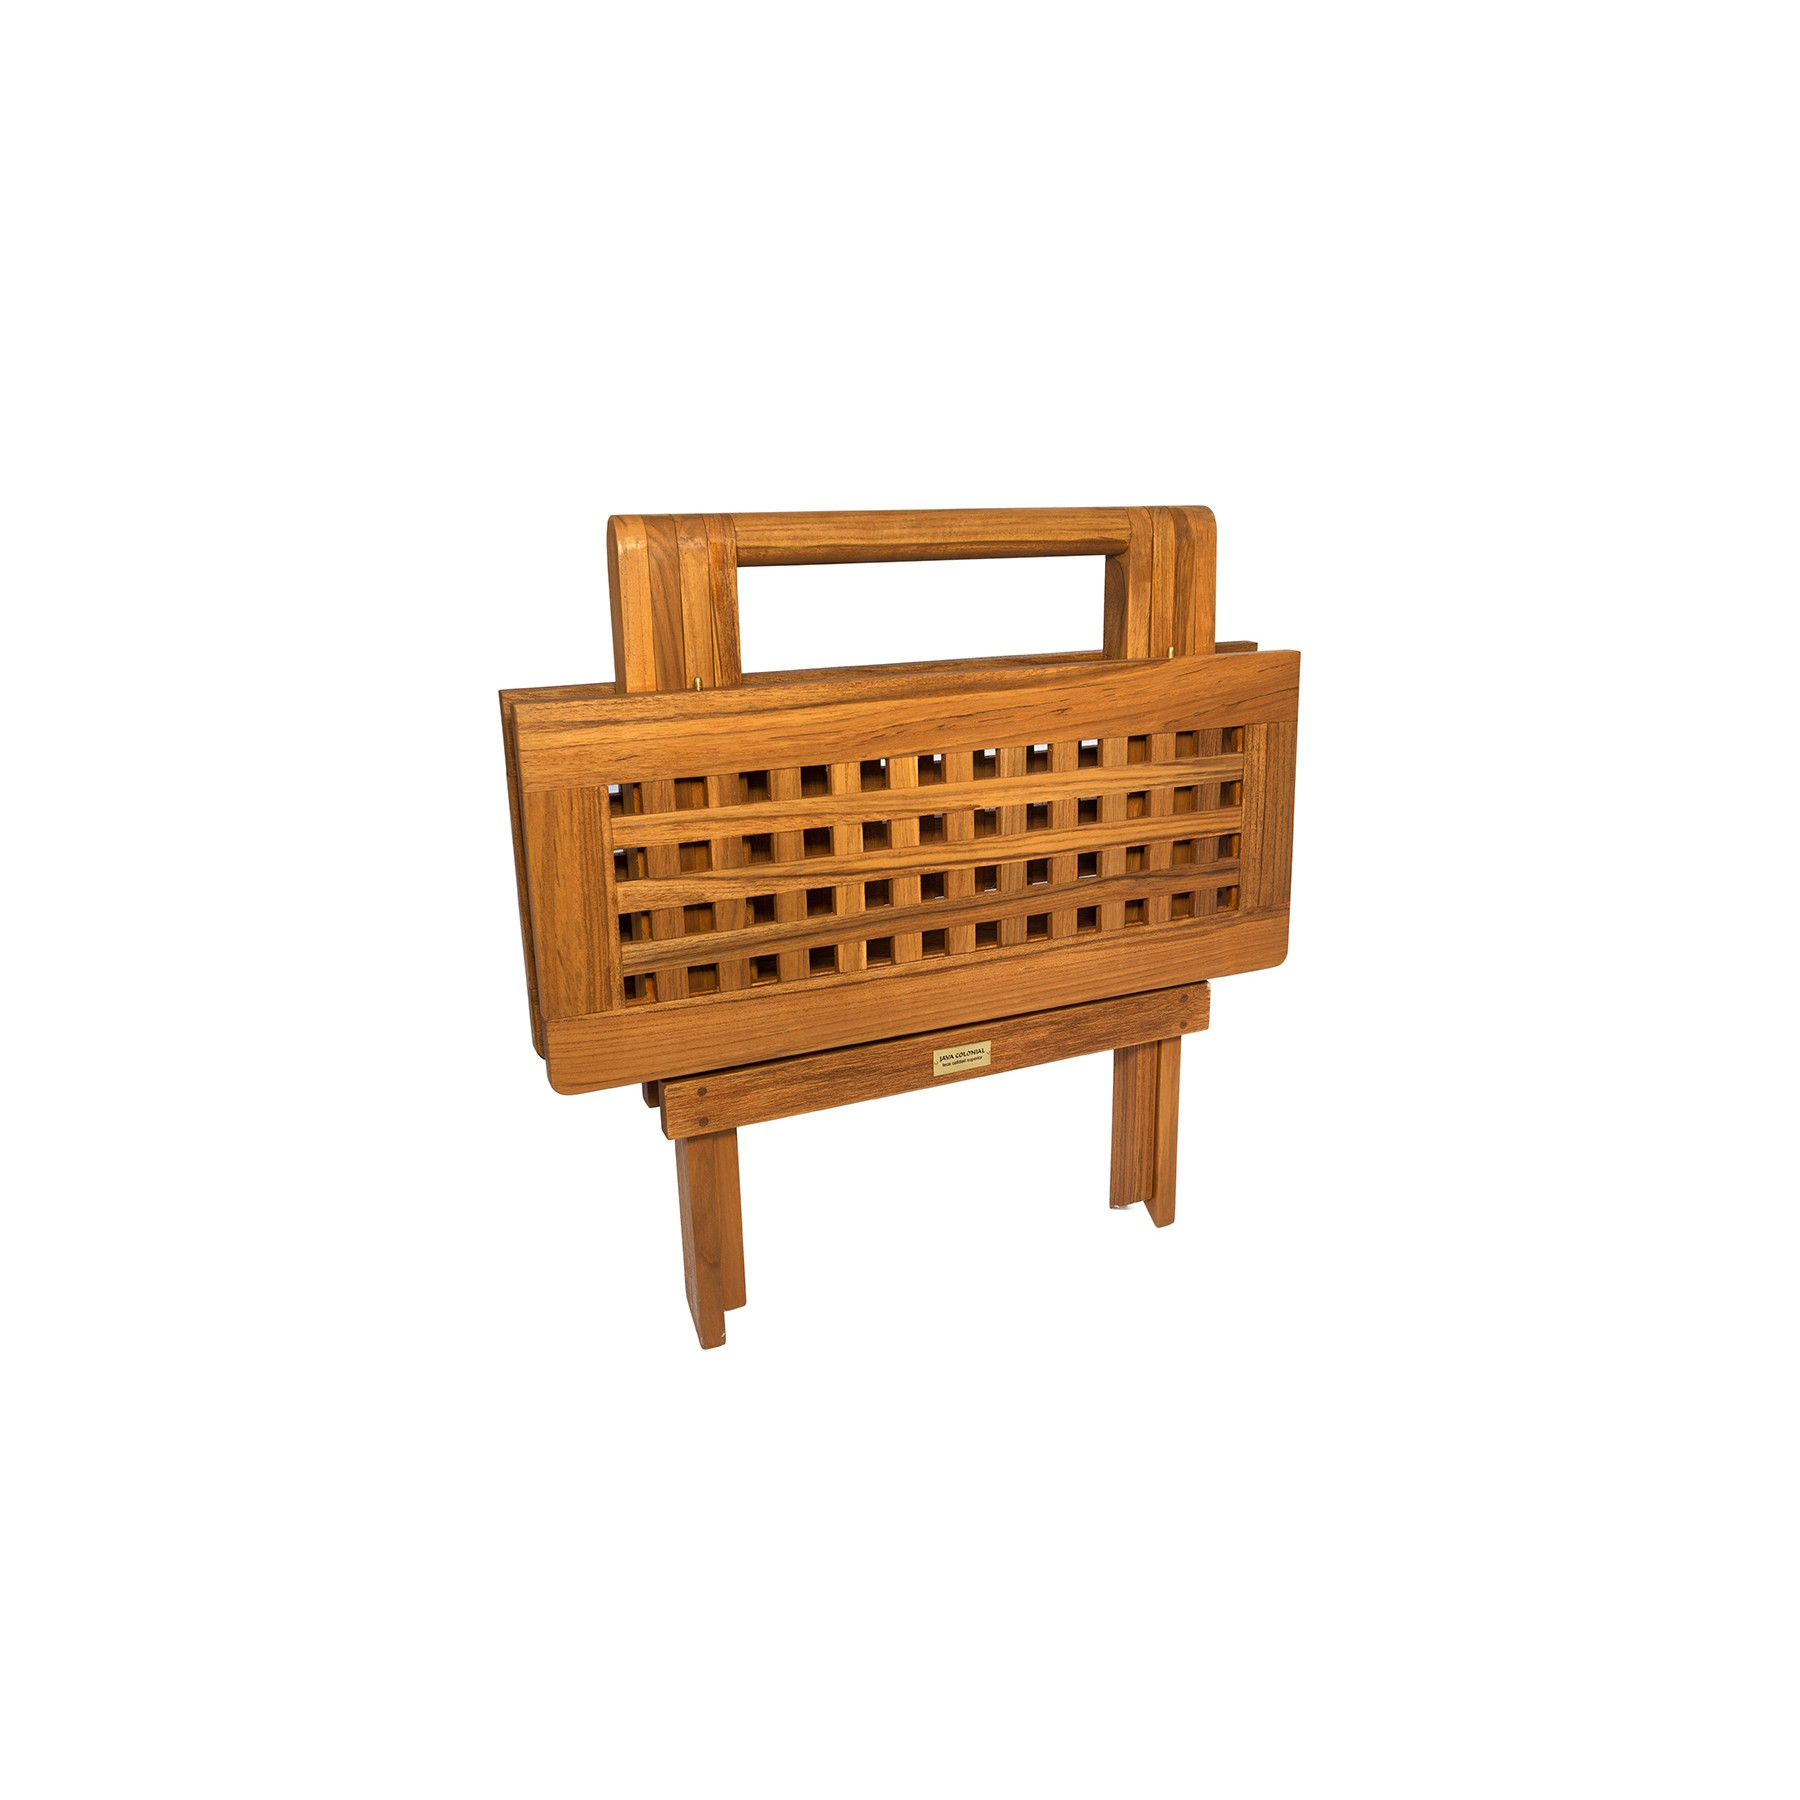 Encantador mesas auxiliares plegables motivo ideas de for Mesa auxiliar plegable ikea